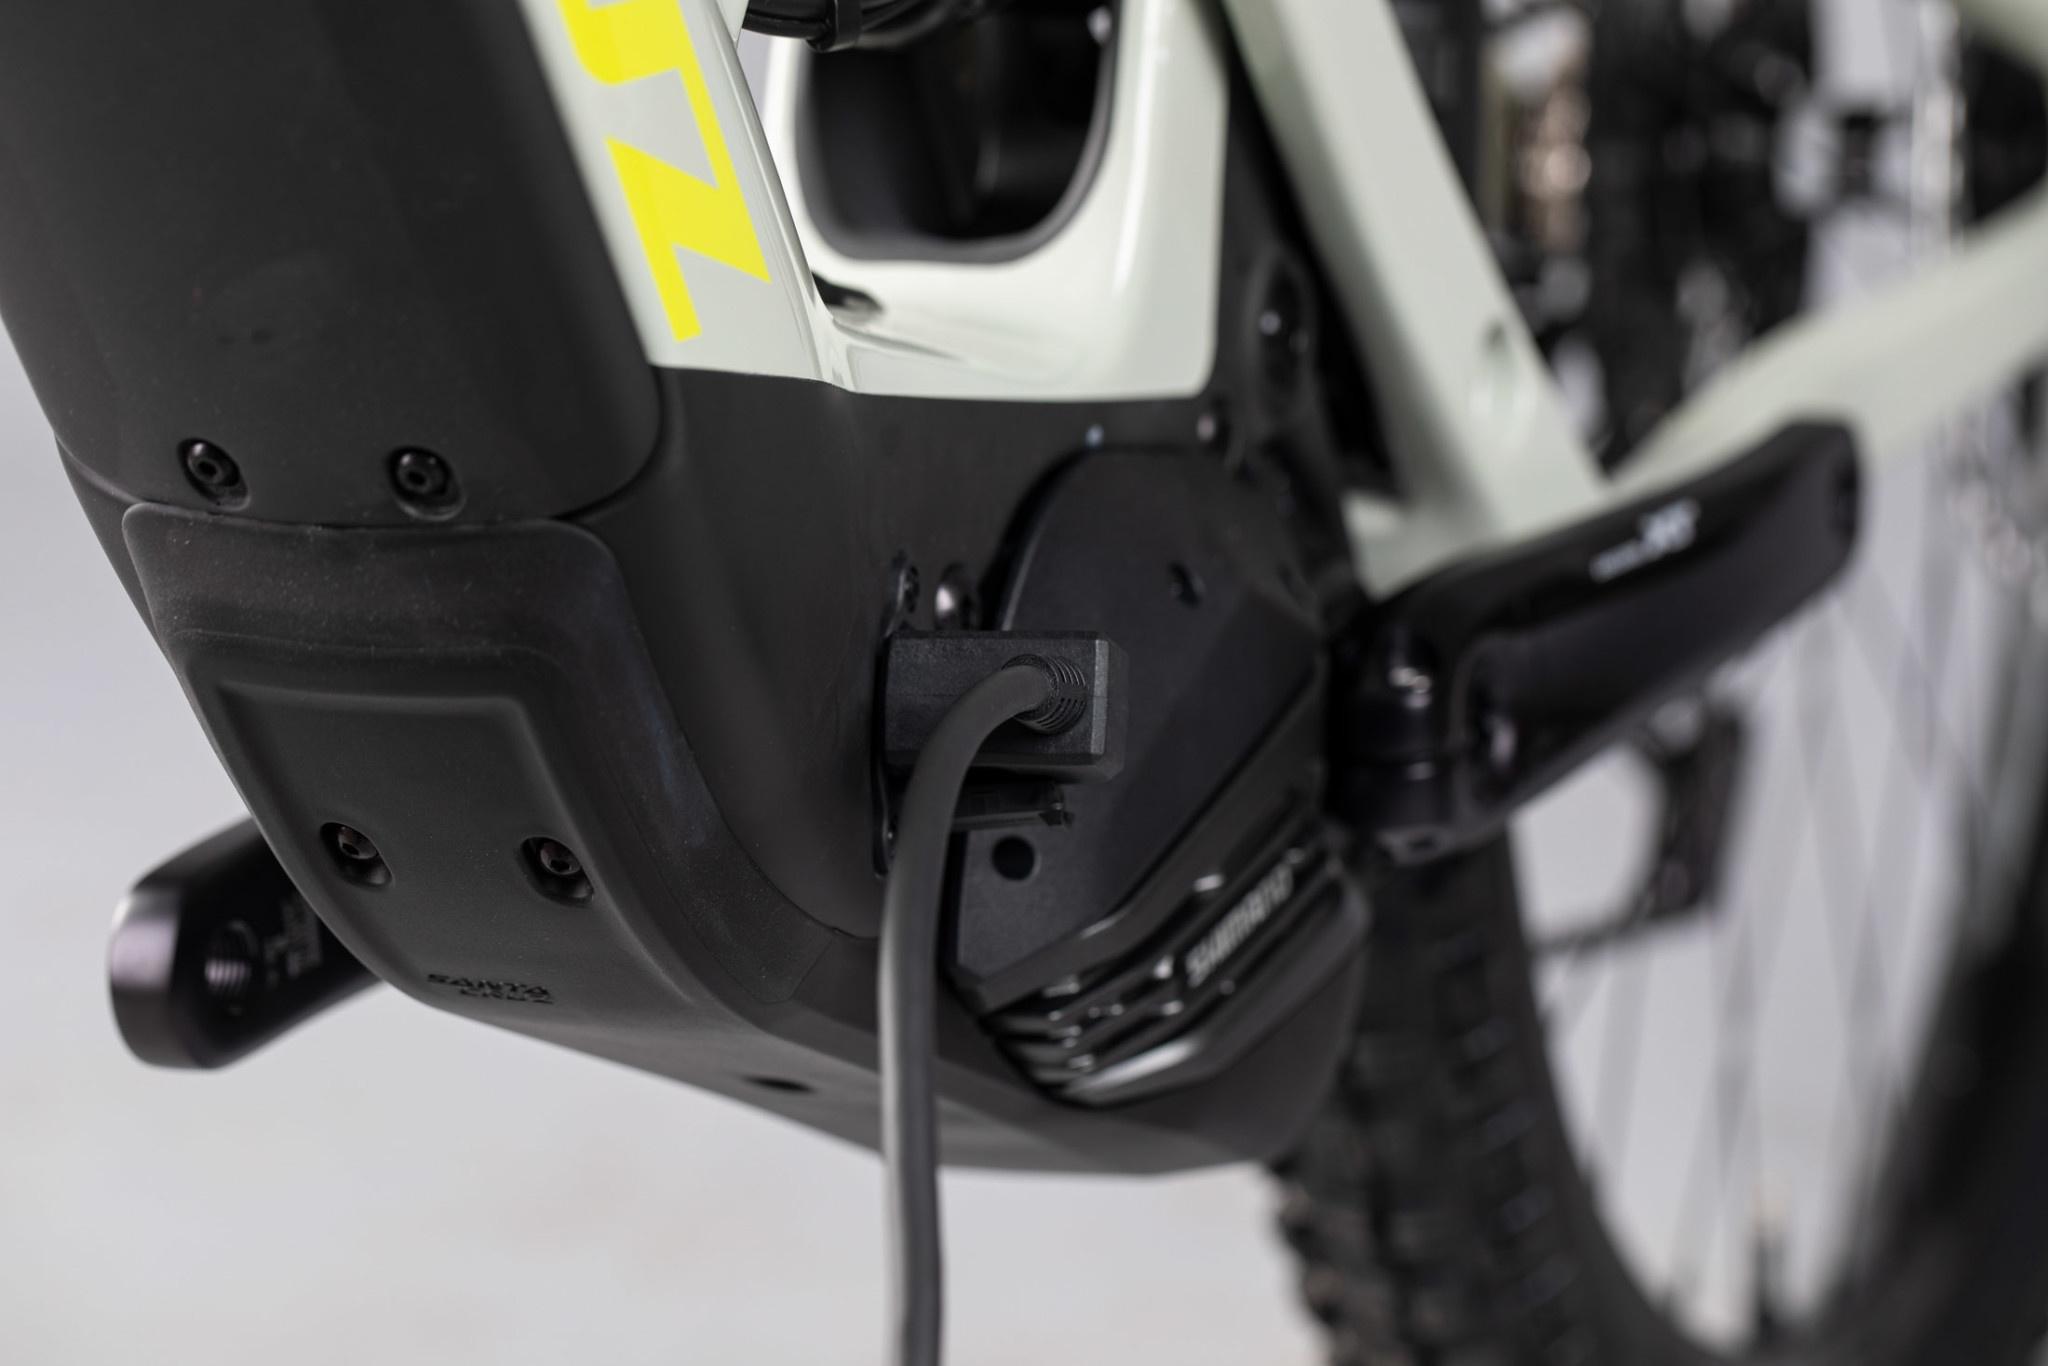 Santa Cruz Santa Cruz Heckler - XT / Carbon CC / MX (2021)